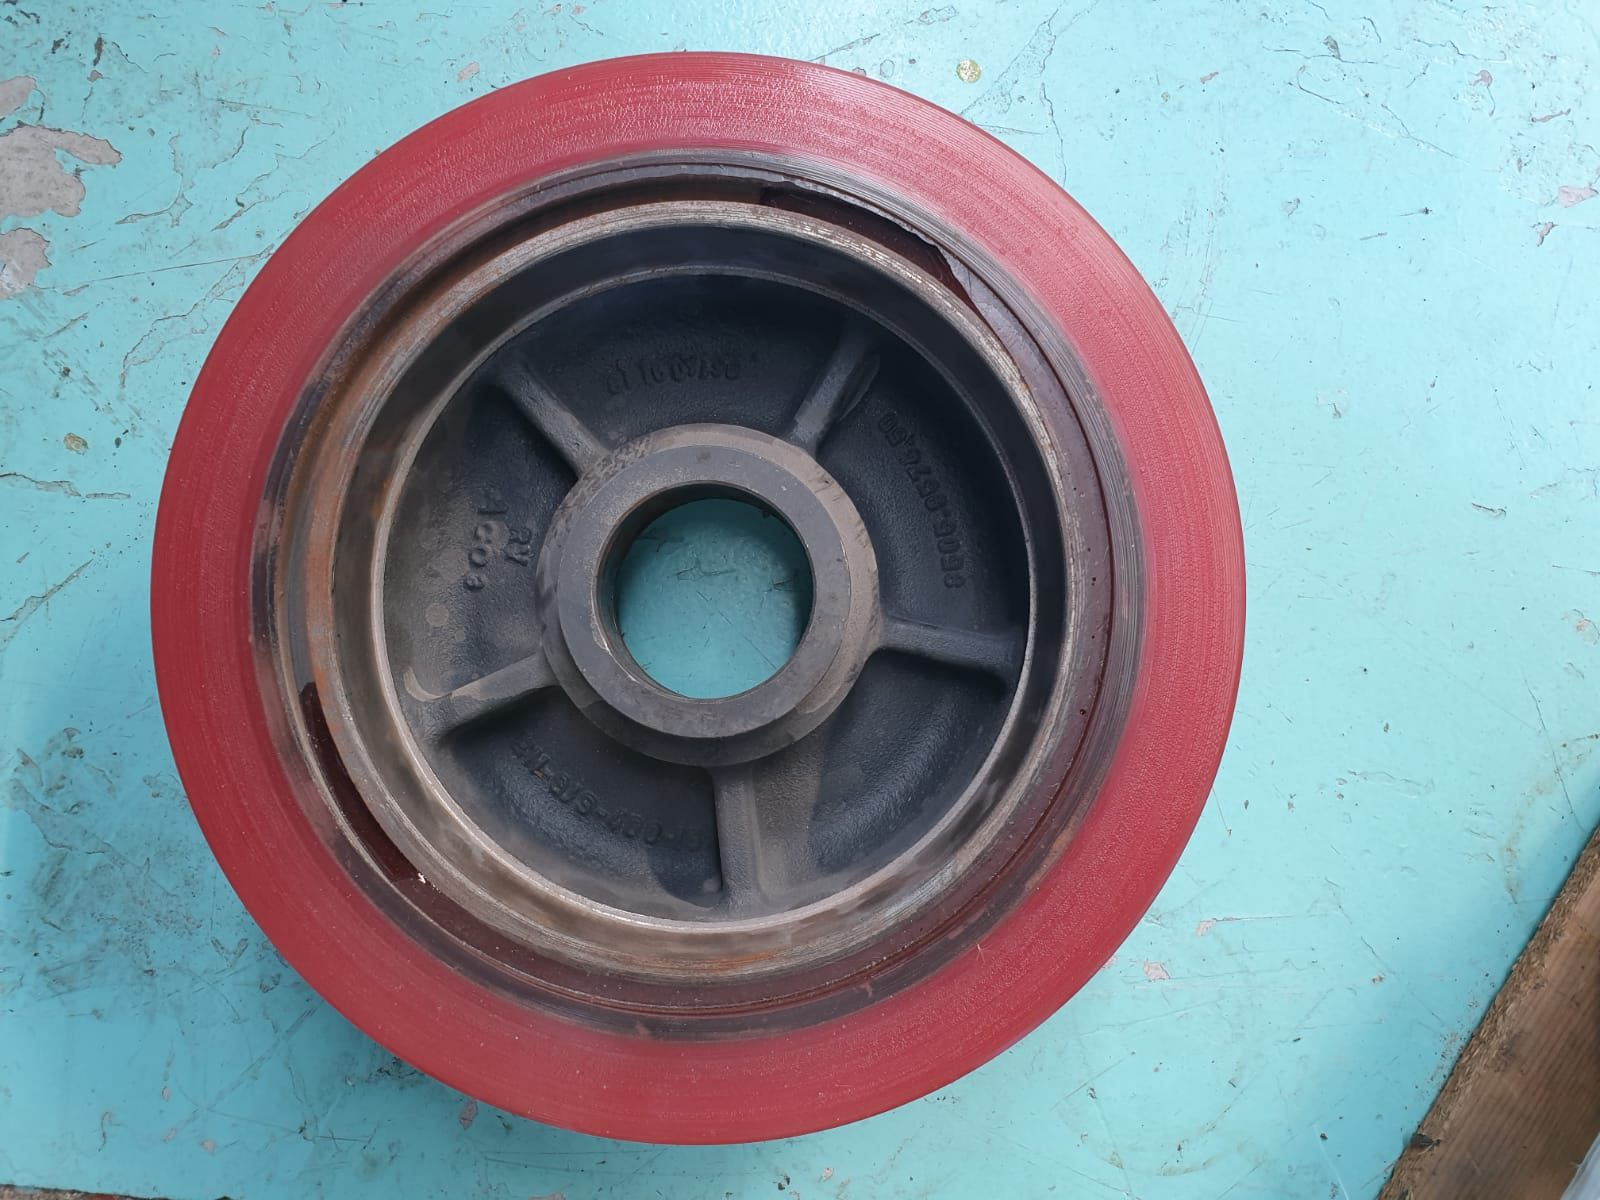 ruota in poliuretano per carrelli elevatori